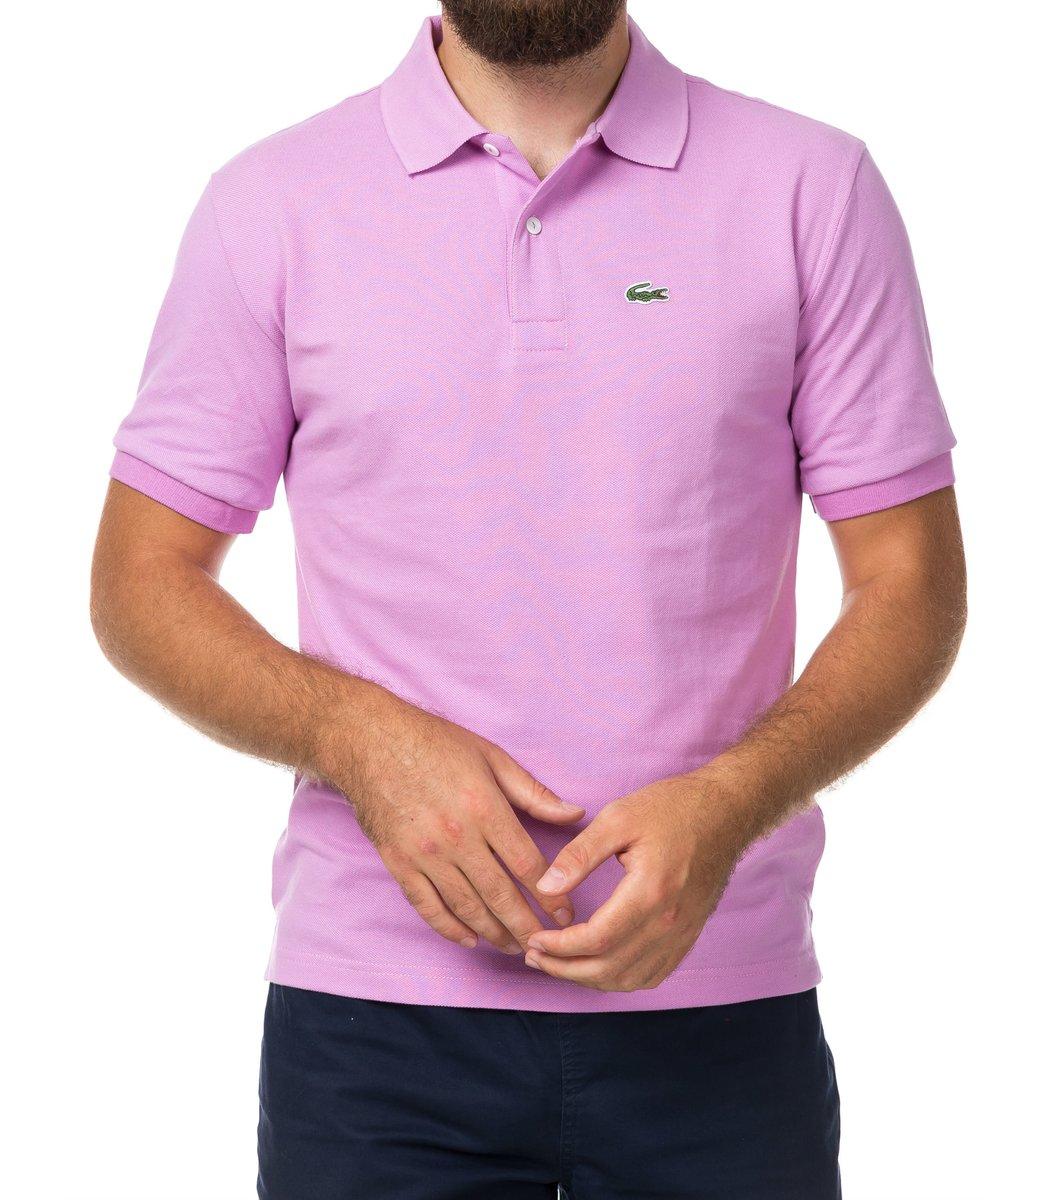 Мужская светло-сиреневая футболка поло Lacoste